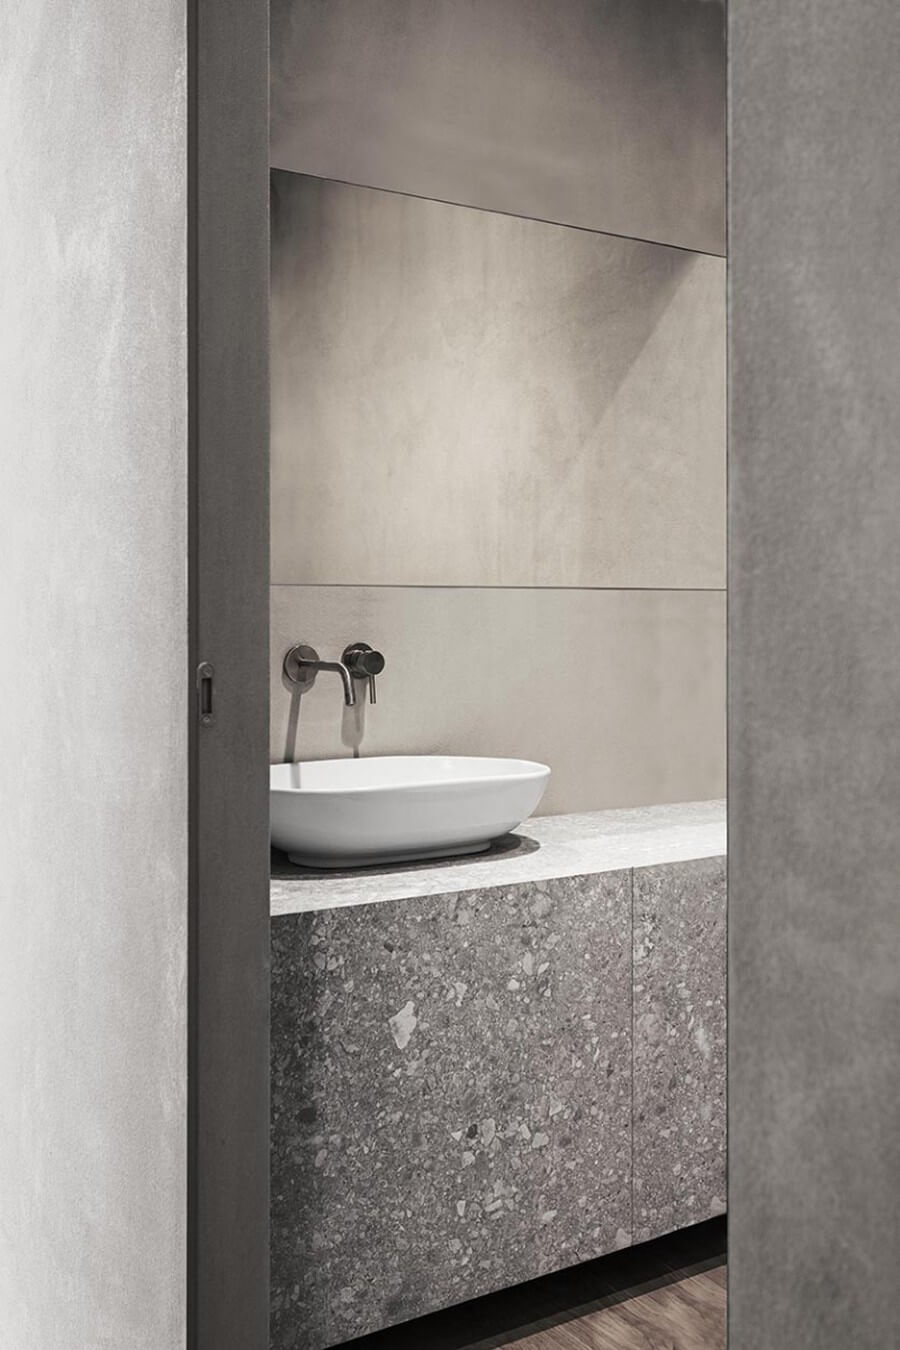 Timeless Bathroom Designs by AIM Studio aim studio Timeless Bathroom Designs by AIM Studio Timeless Bathroom Designs by AIM Studio 1